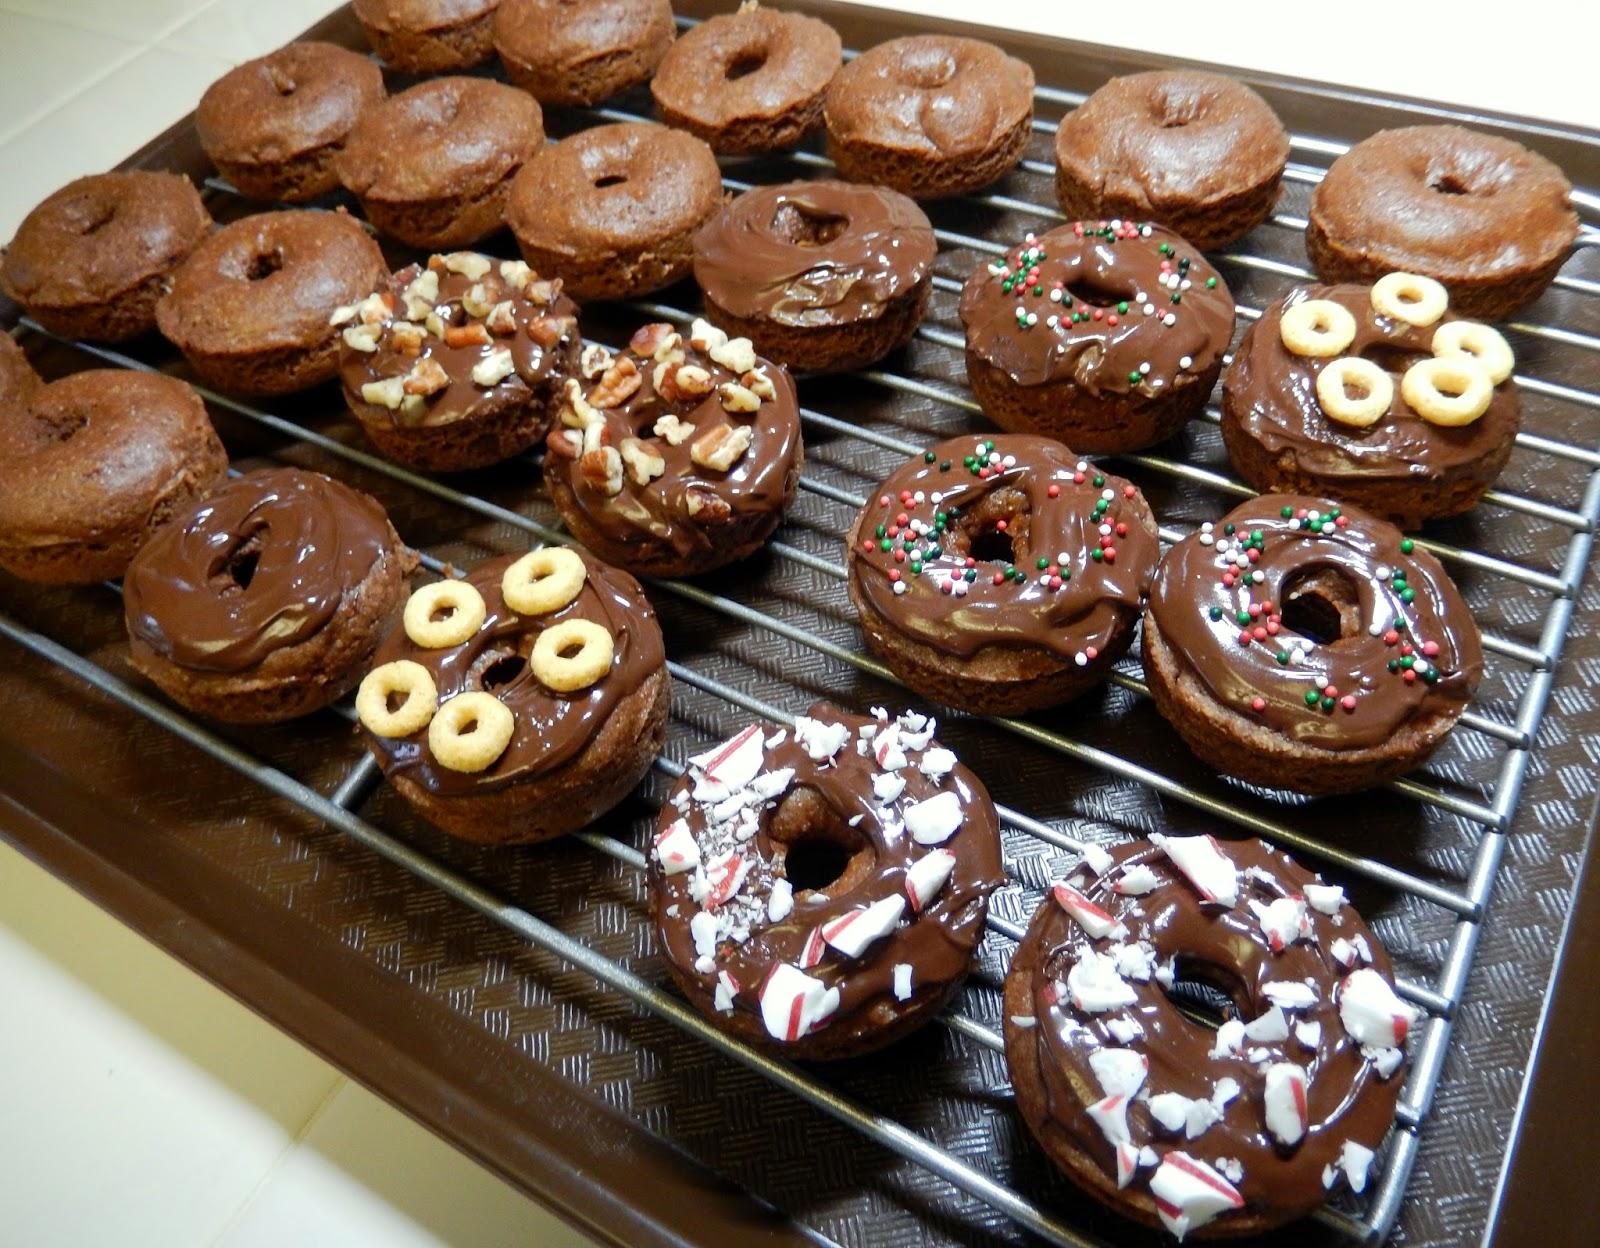 Protein%2BDonuts%2BDoughnuts Weight Loss Recipes Christmas Tree Trimming Treats